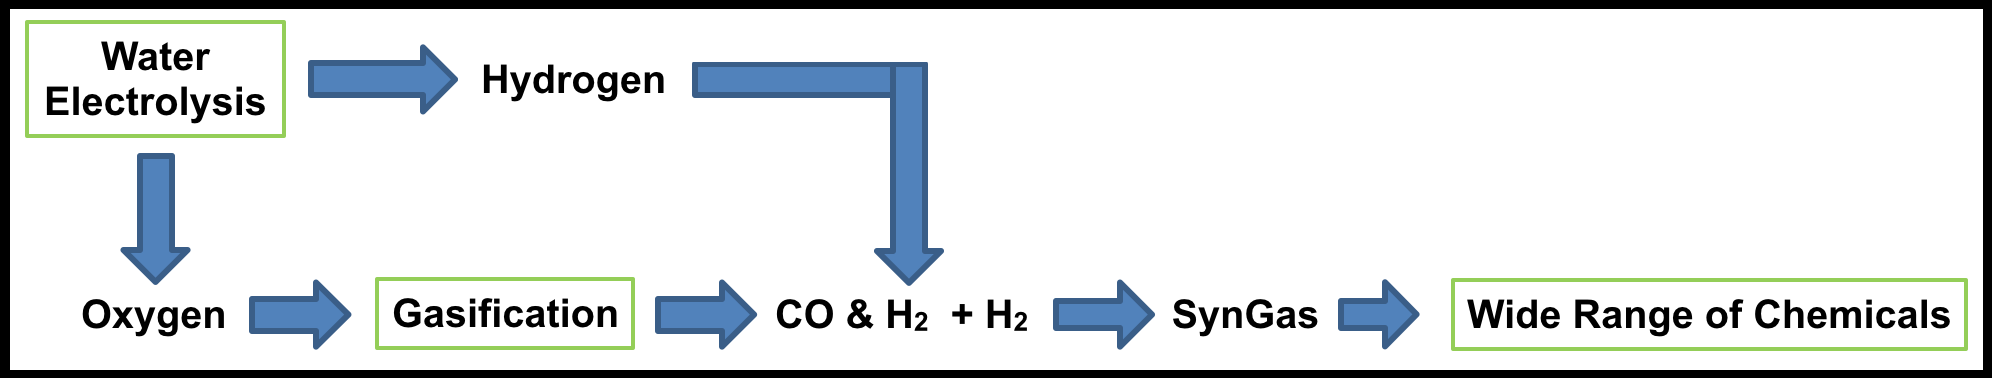 Case Study One Diagram